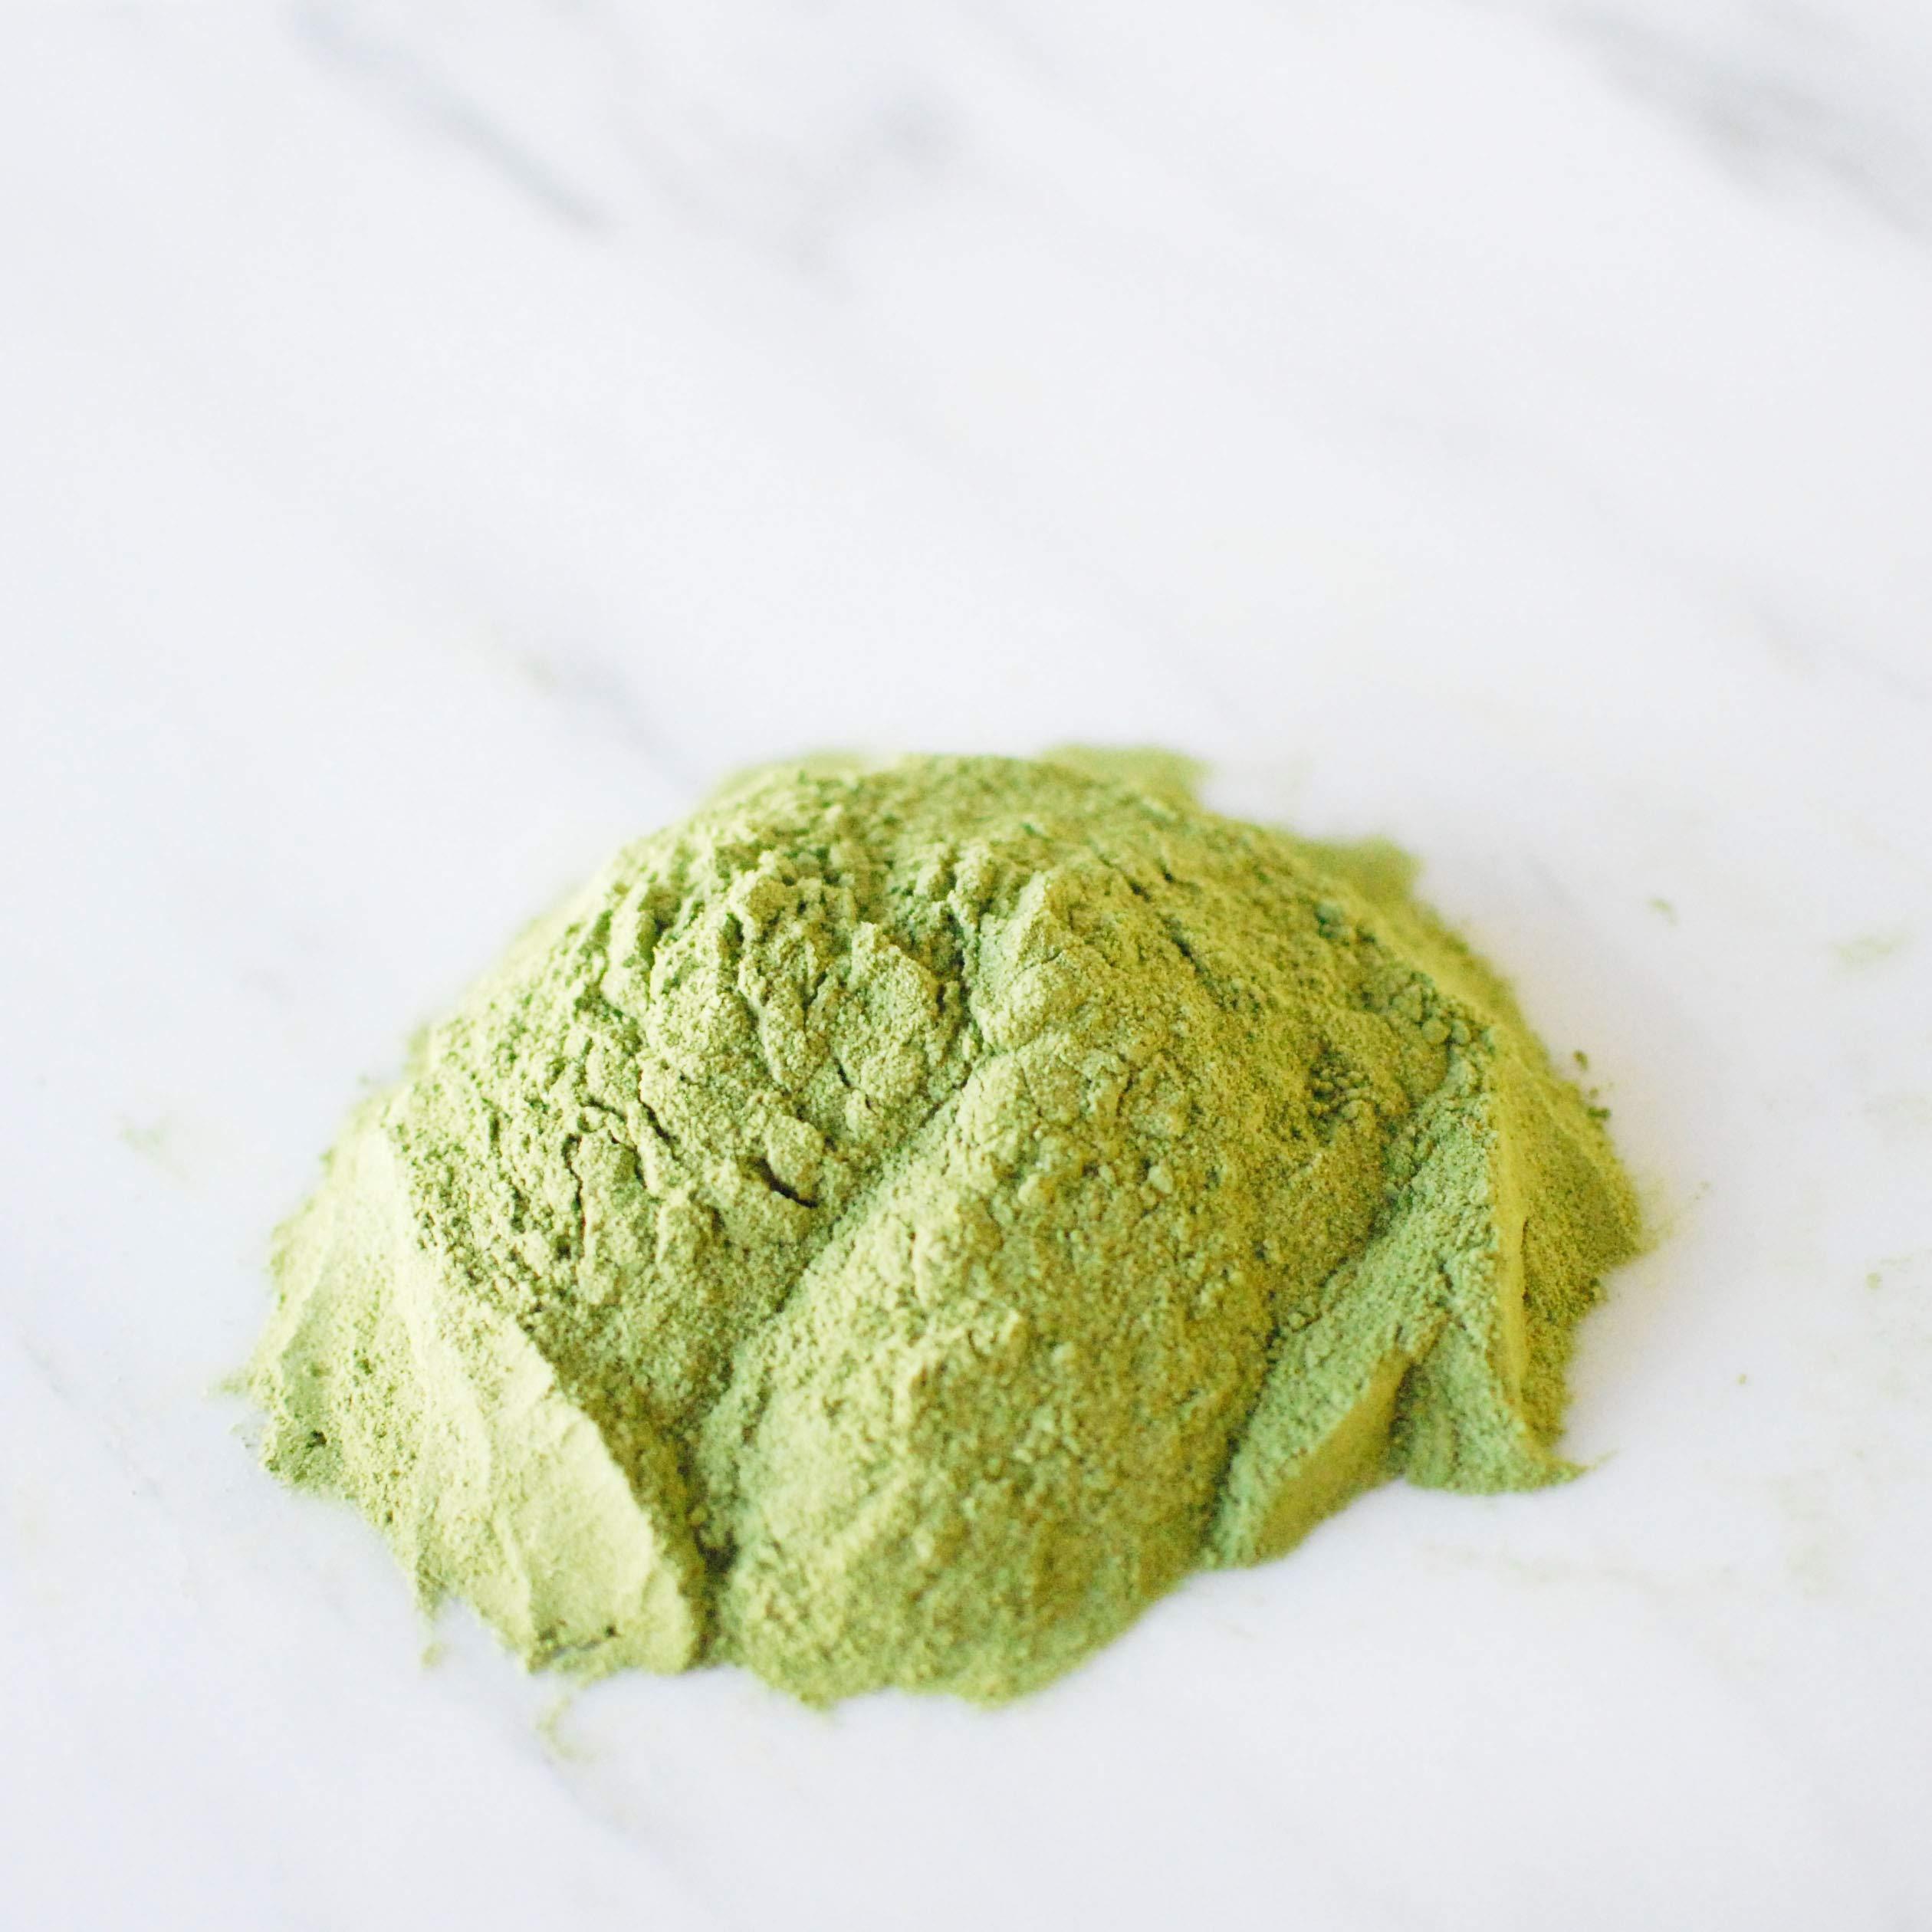 Organic Matcha Green Powdered Tea: 2.2lb.